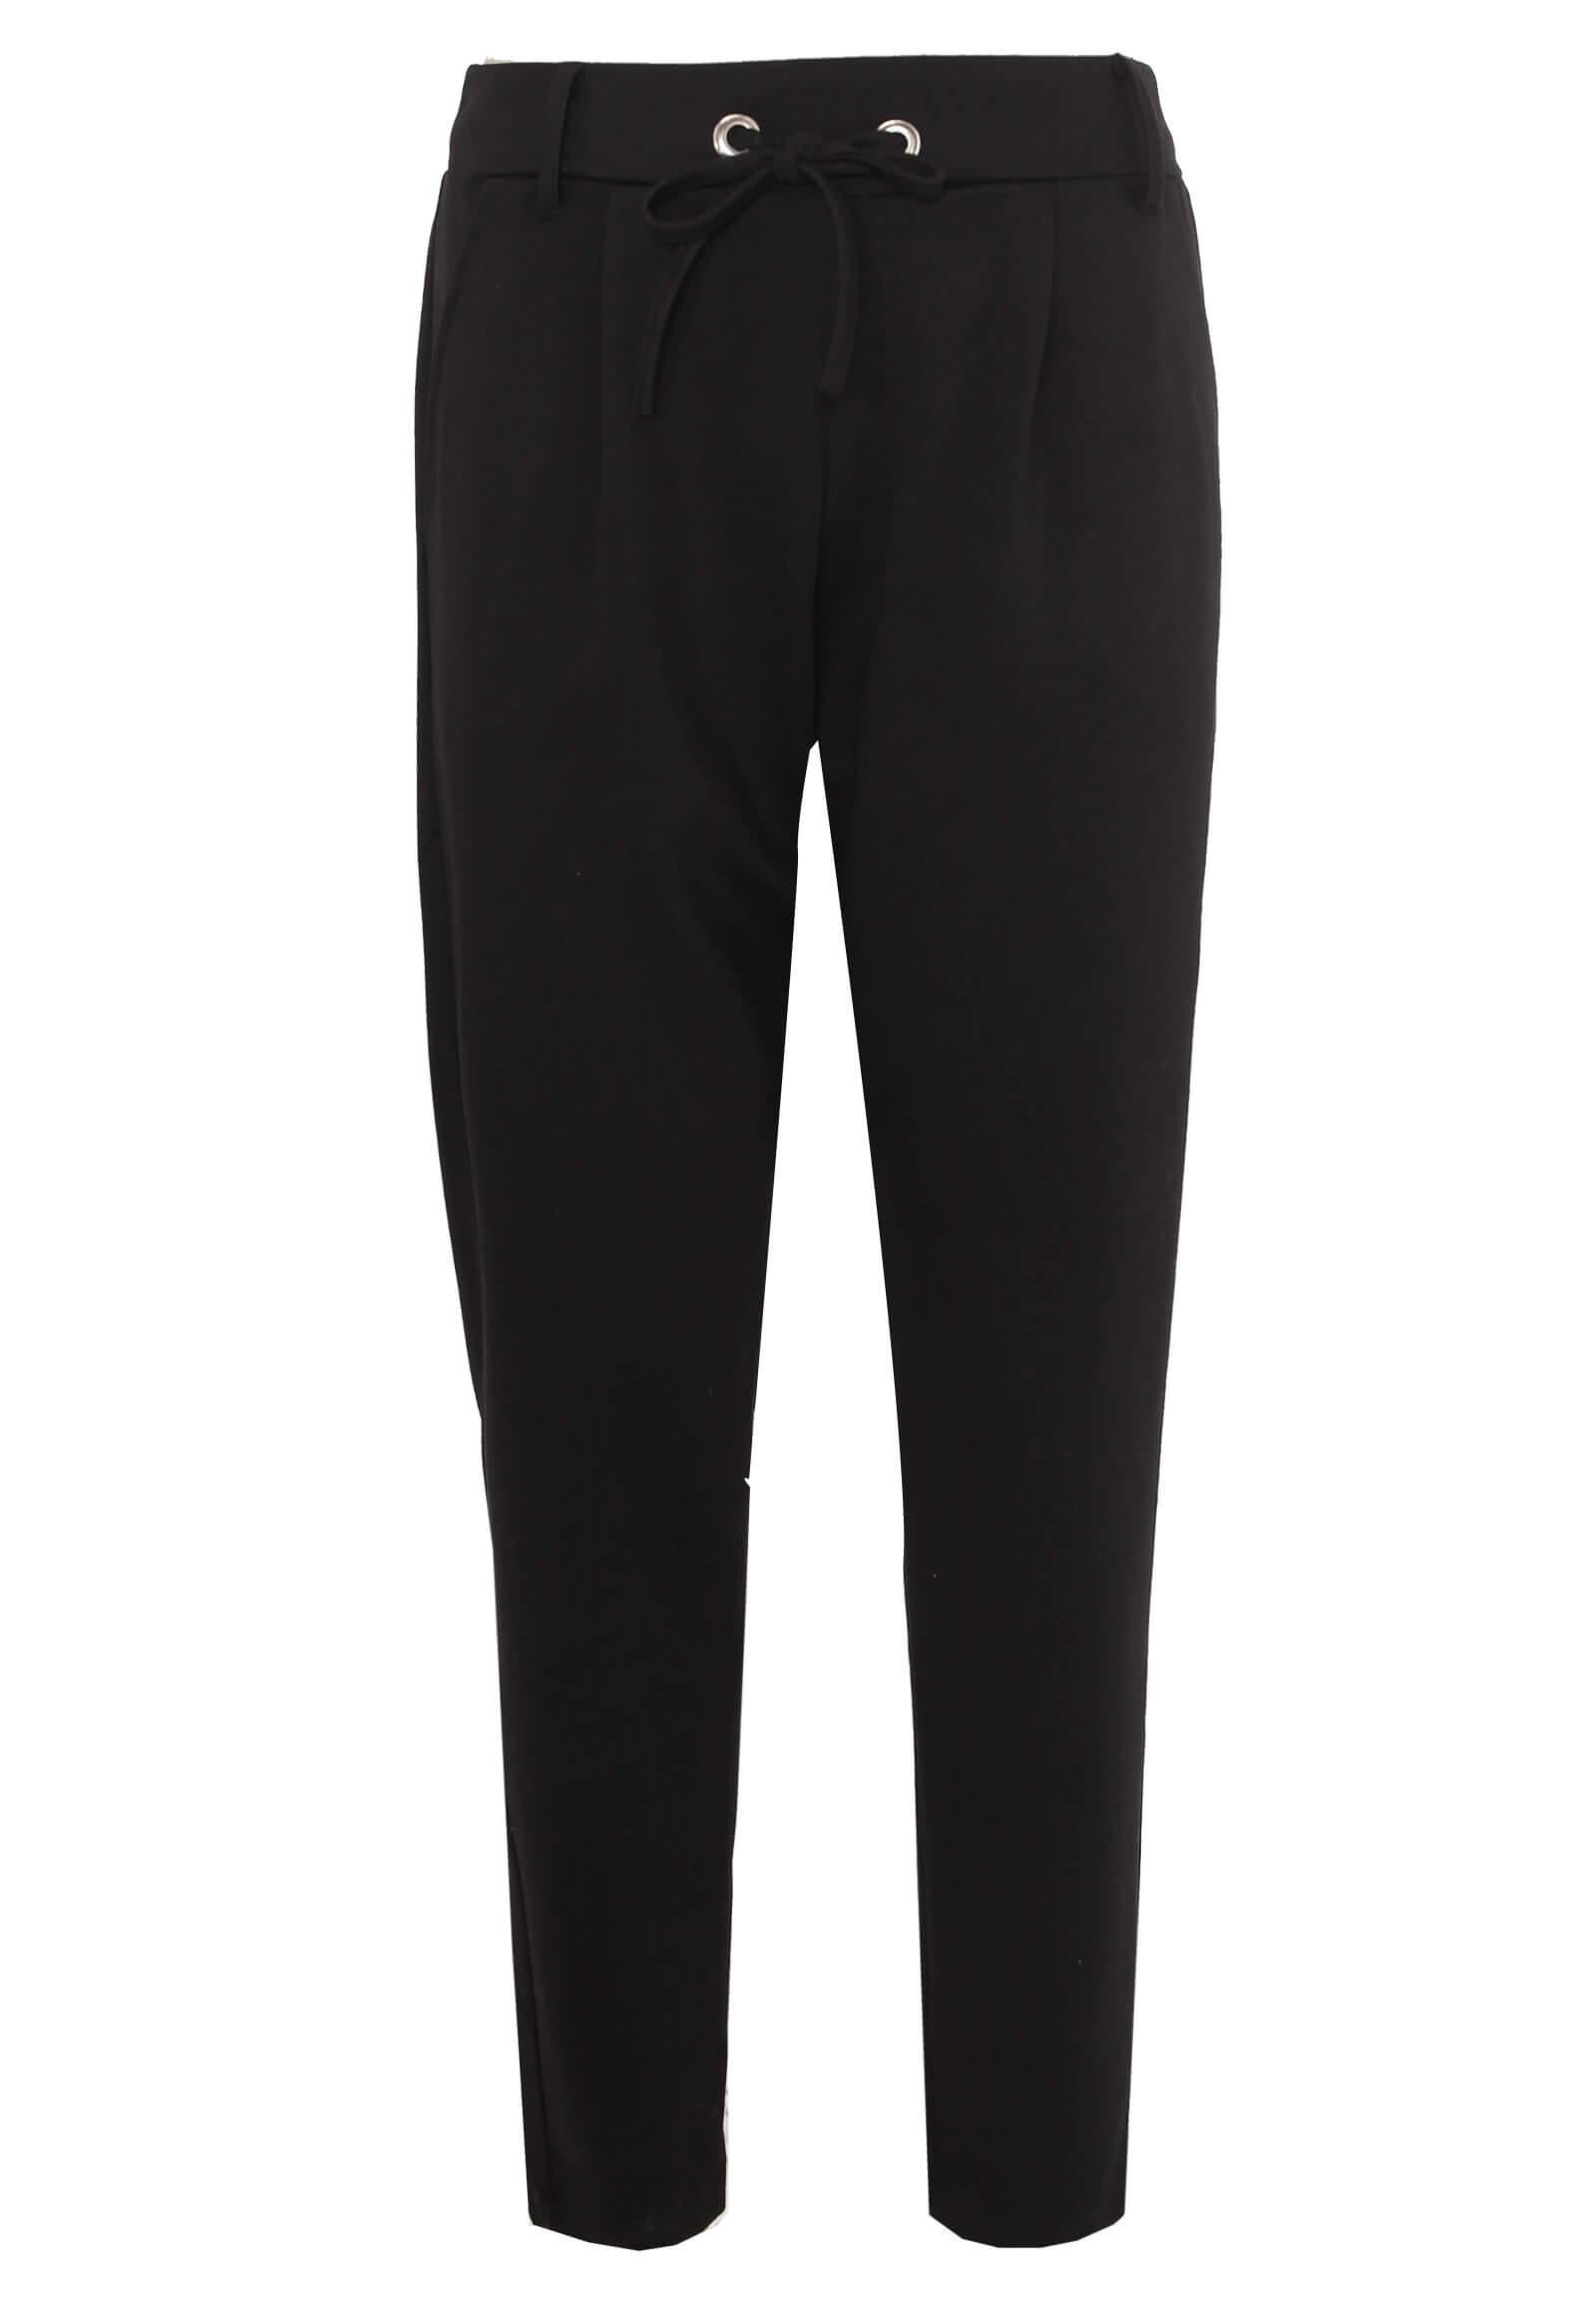 Schwarze Jogg-Pants